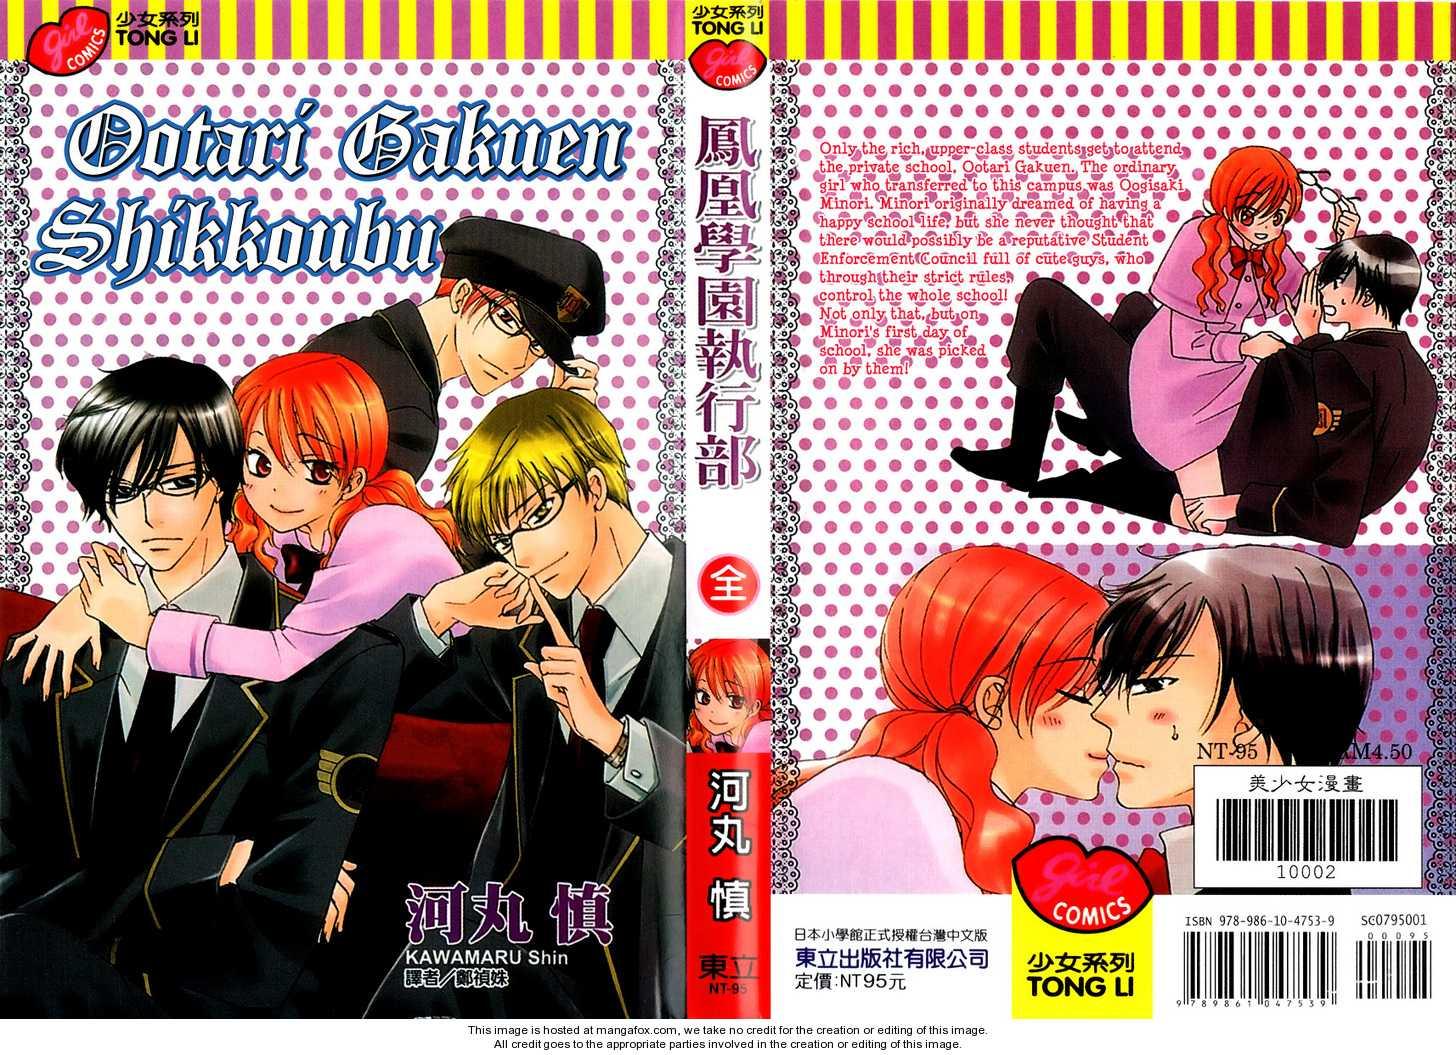 Ootari Gakuen Shikkoubu 1 Page 1